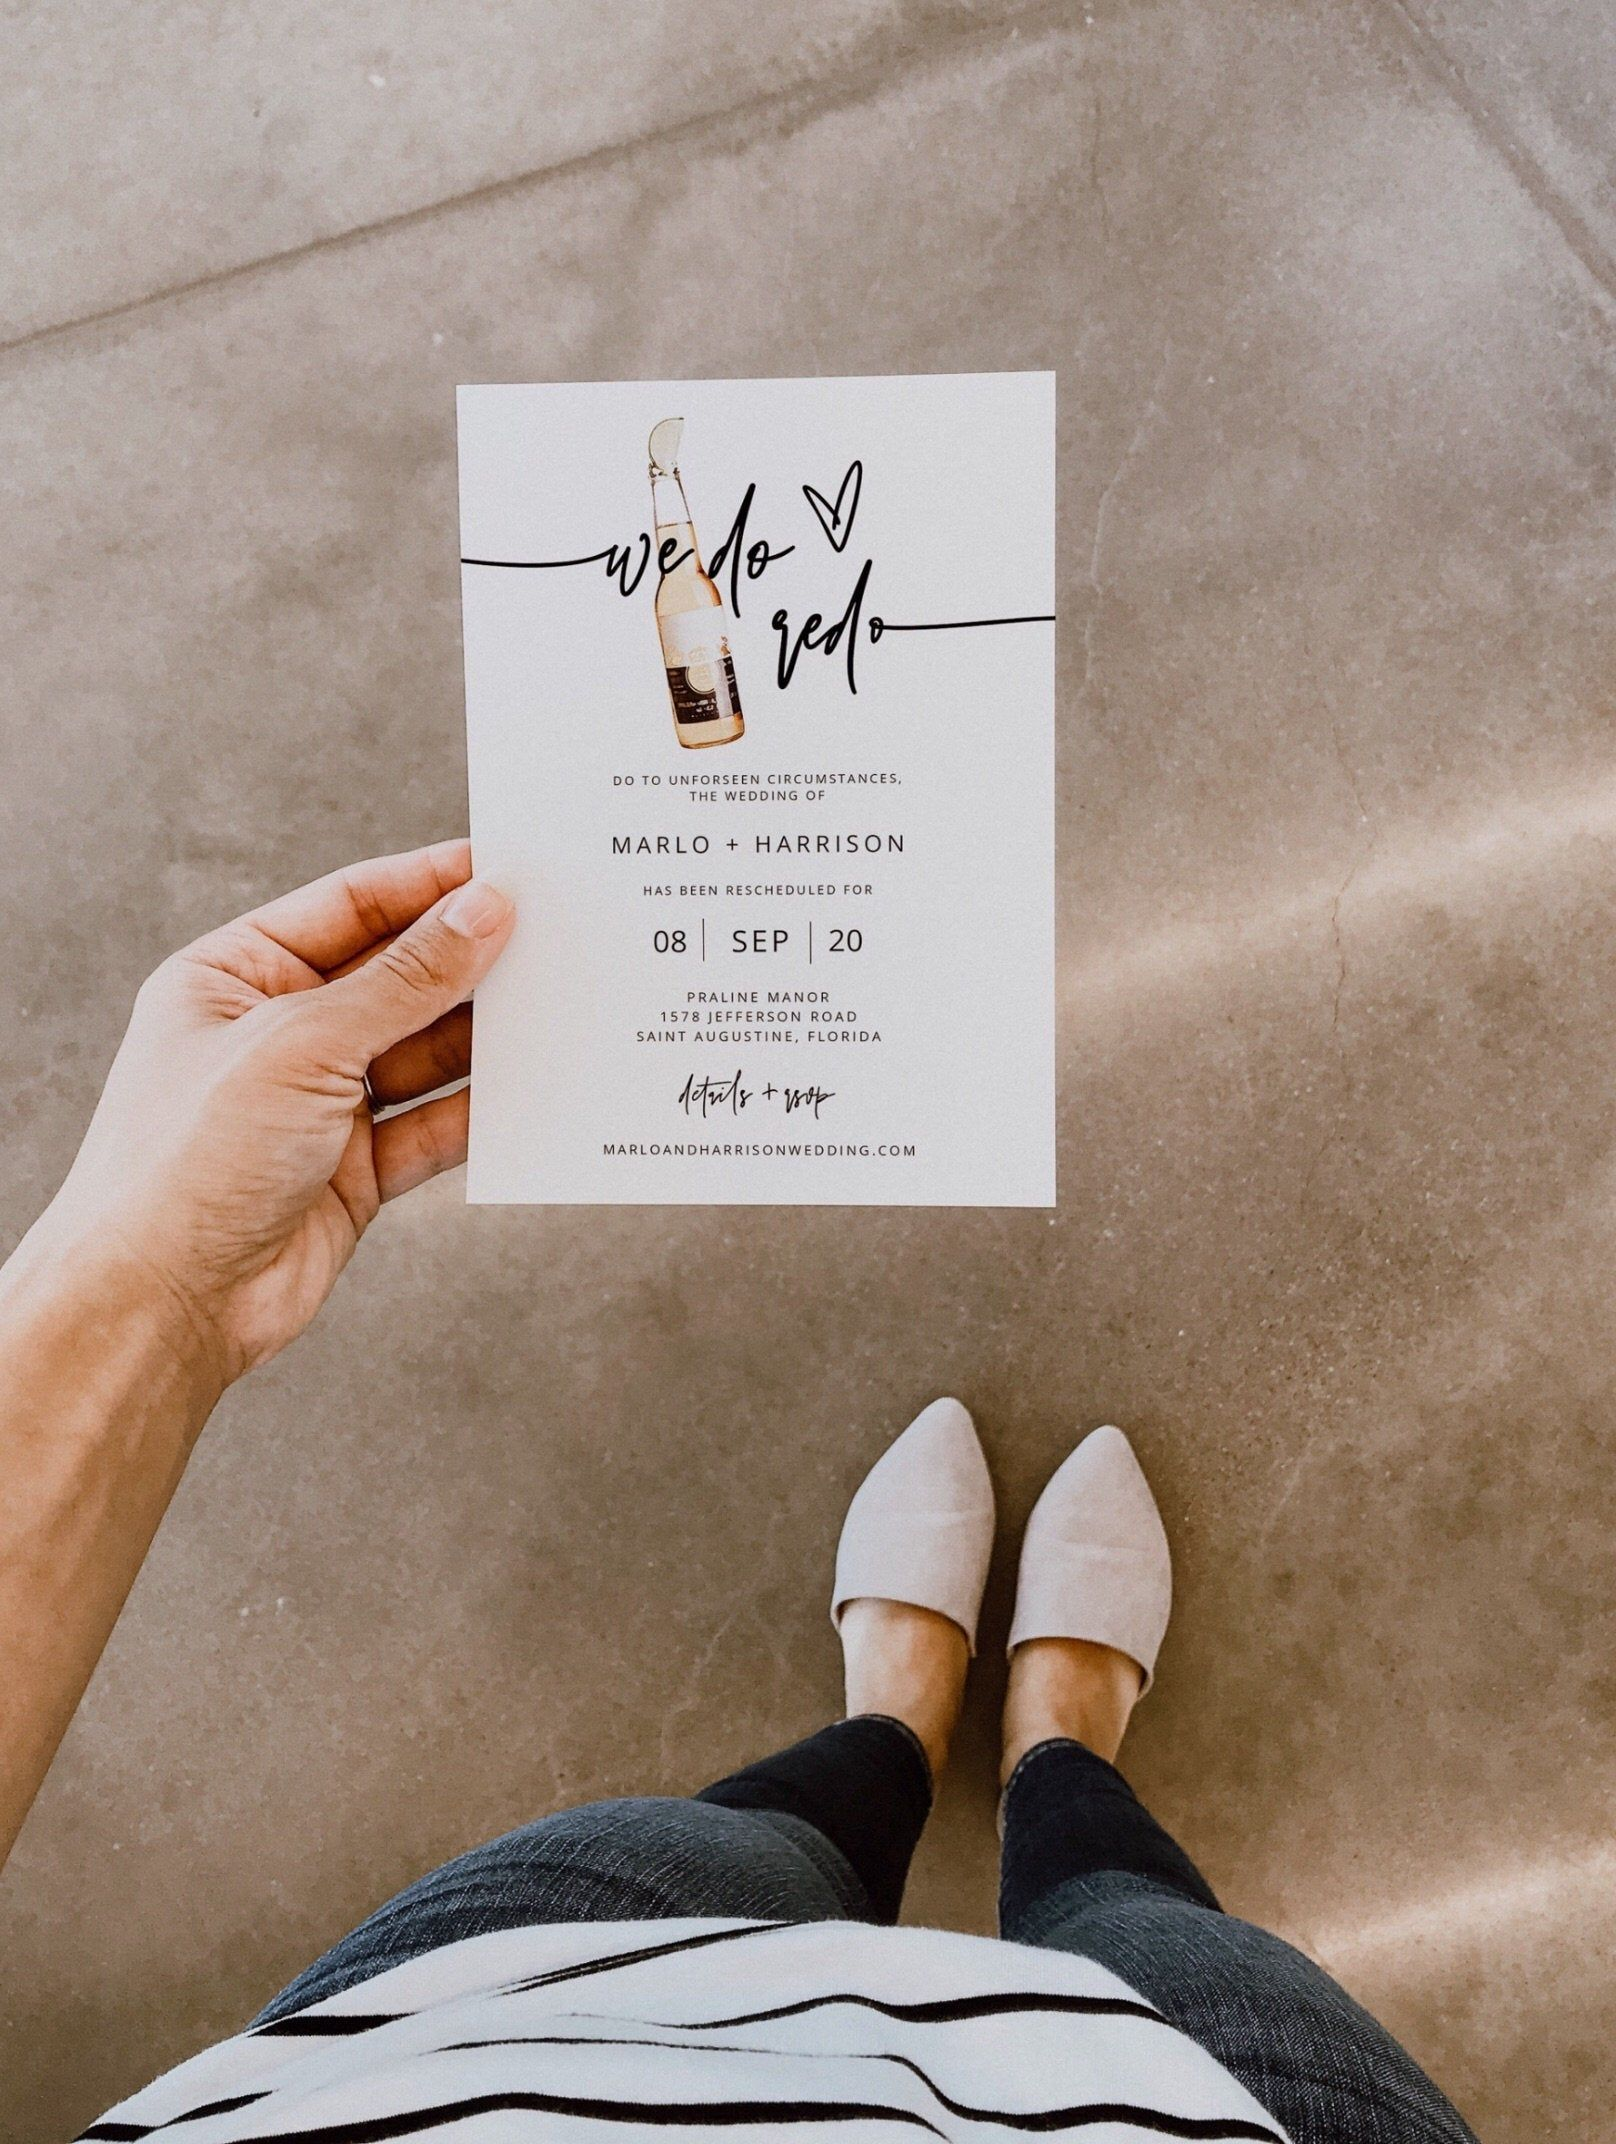 25+ Wedding postponement wording funny ideas in 2021